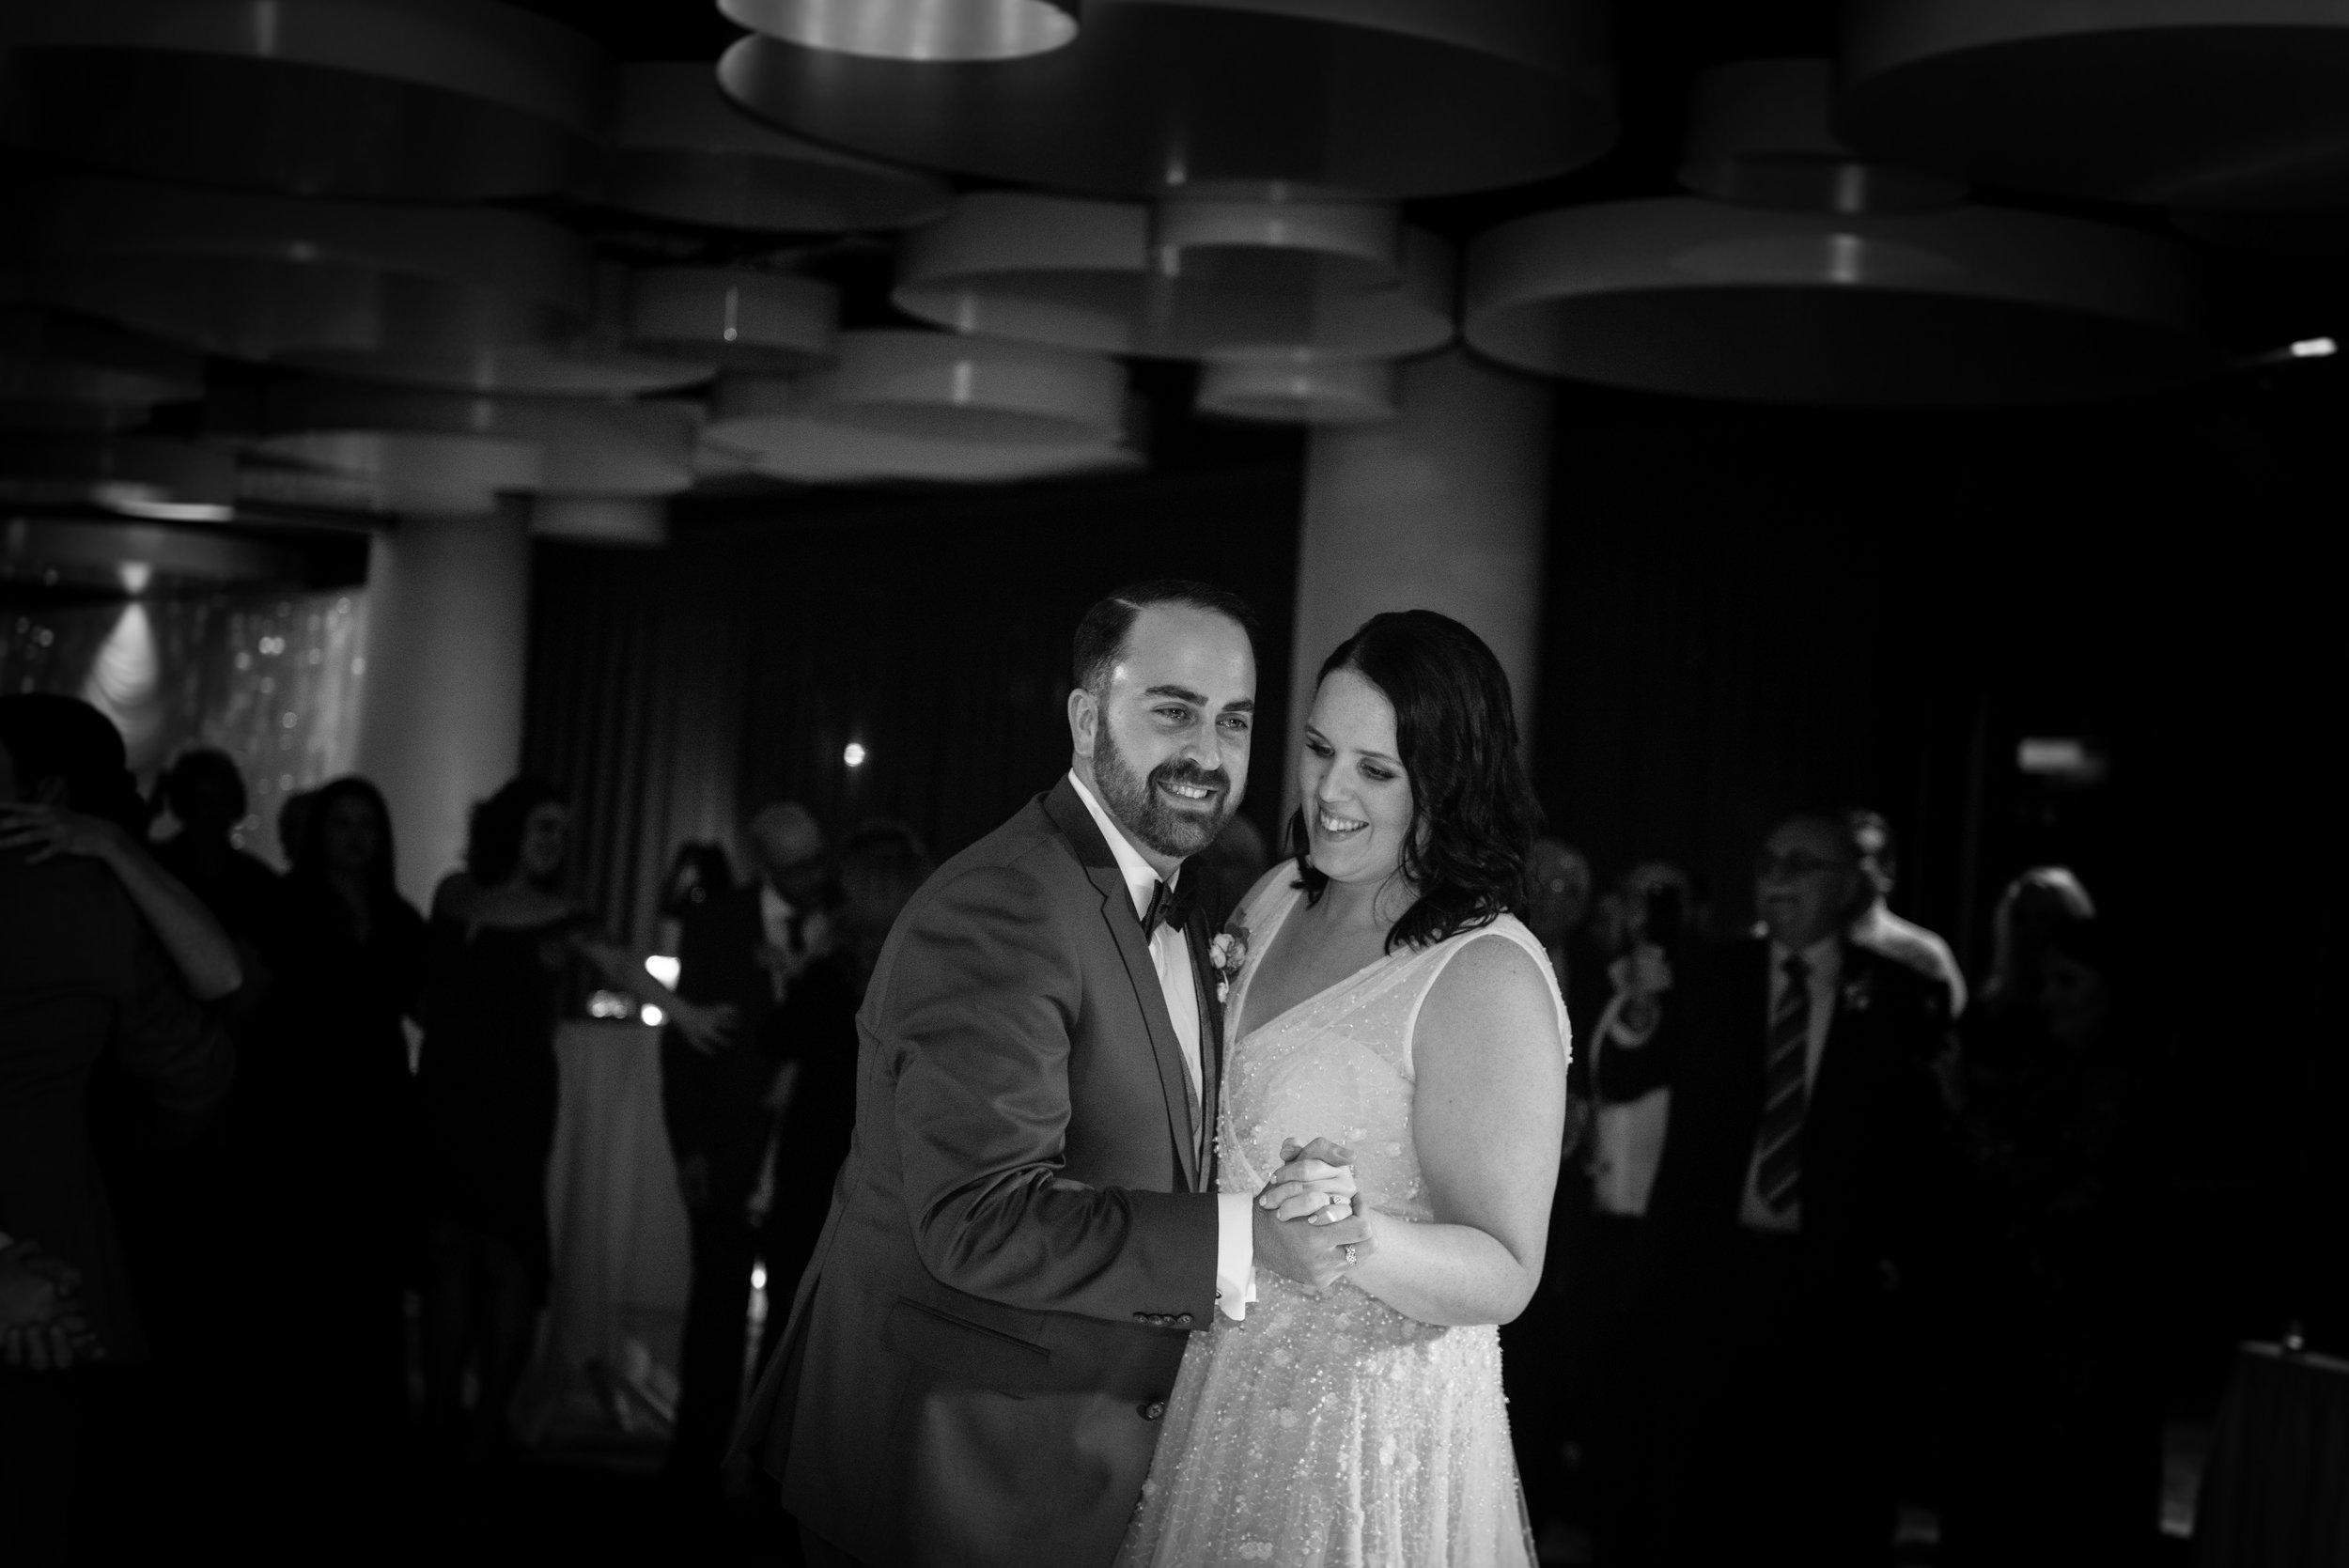 brisbane-city-wedding-photographer-romantic-wedding-116.jpg